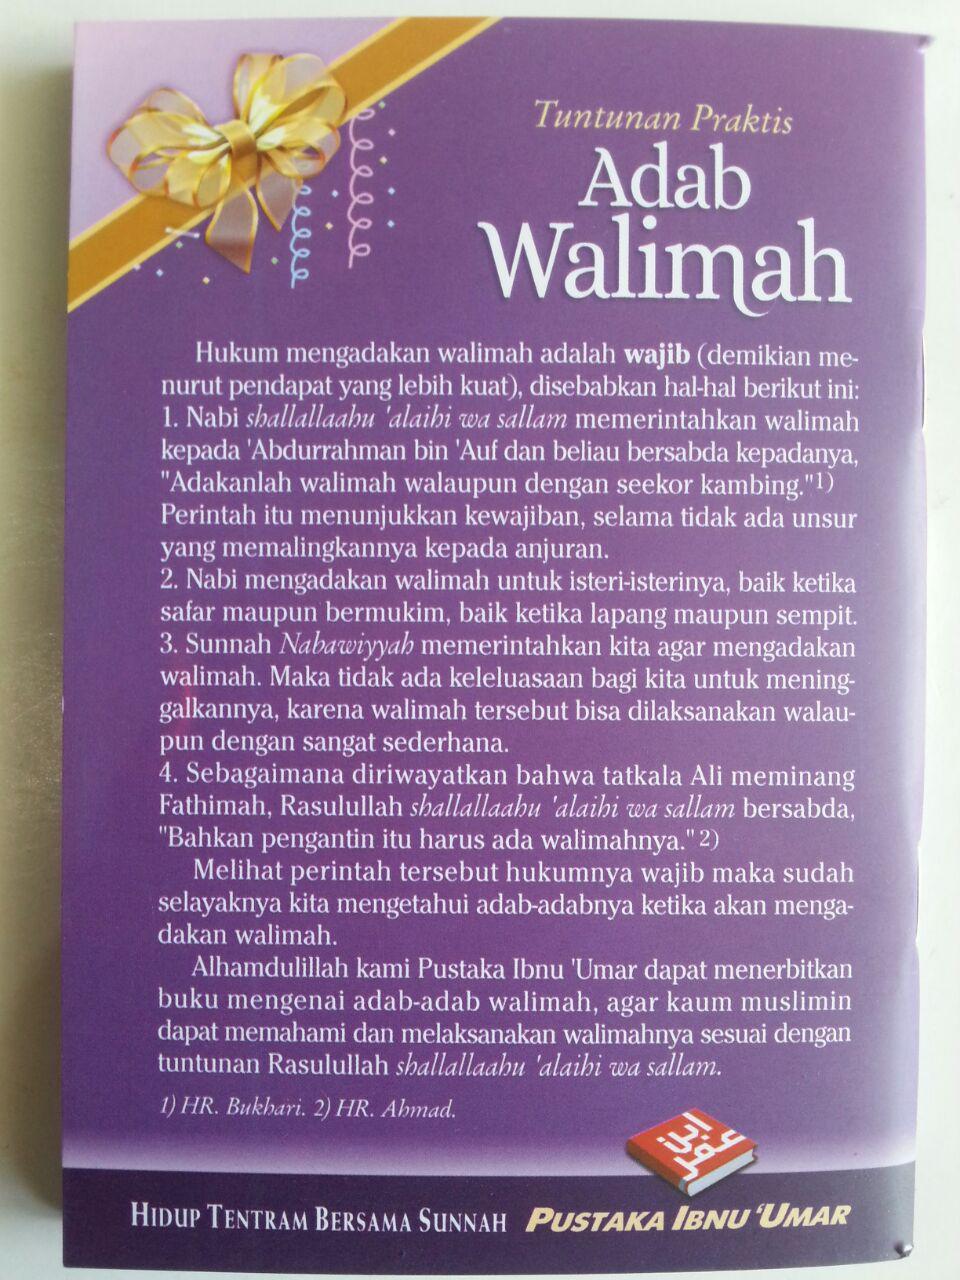 Buku Saku Tuntunan Praktis Adab Walimah Menurut Qur'an Dan Sunnah cover